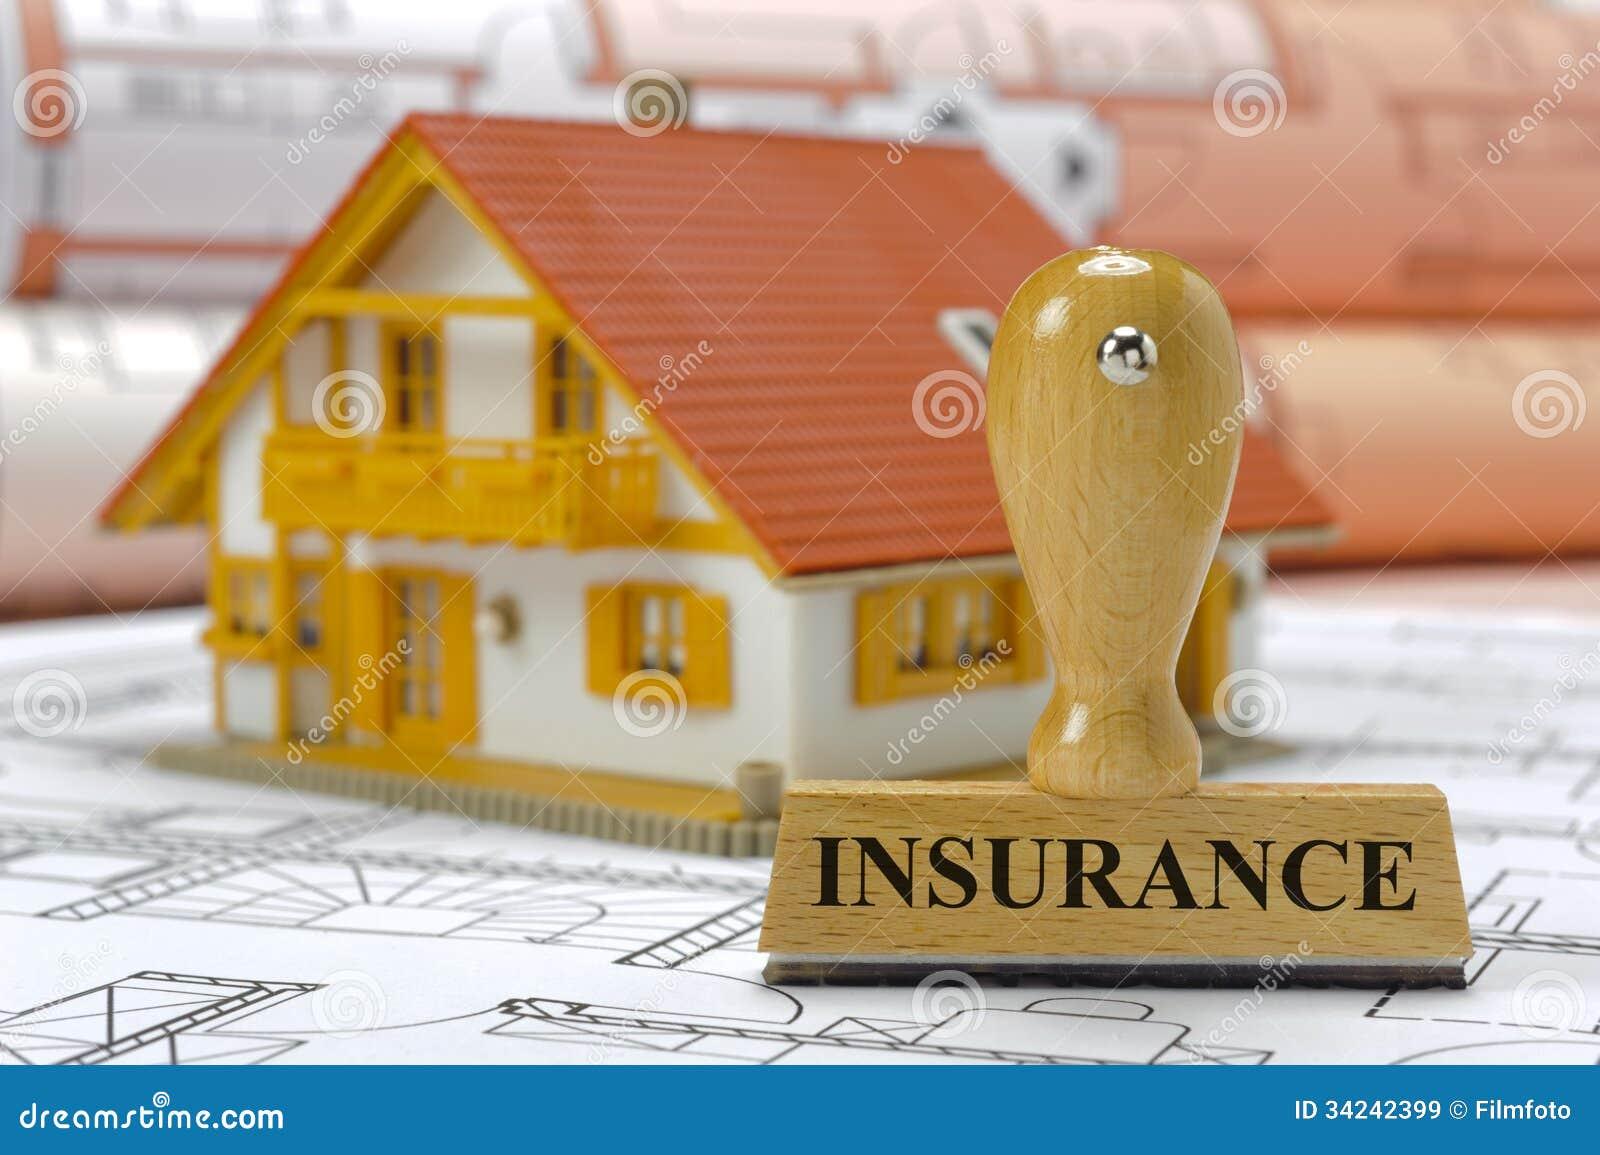 House Construction House Construction Insurance